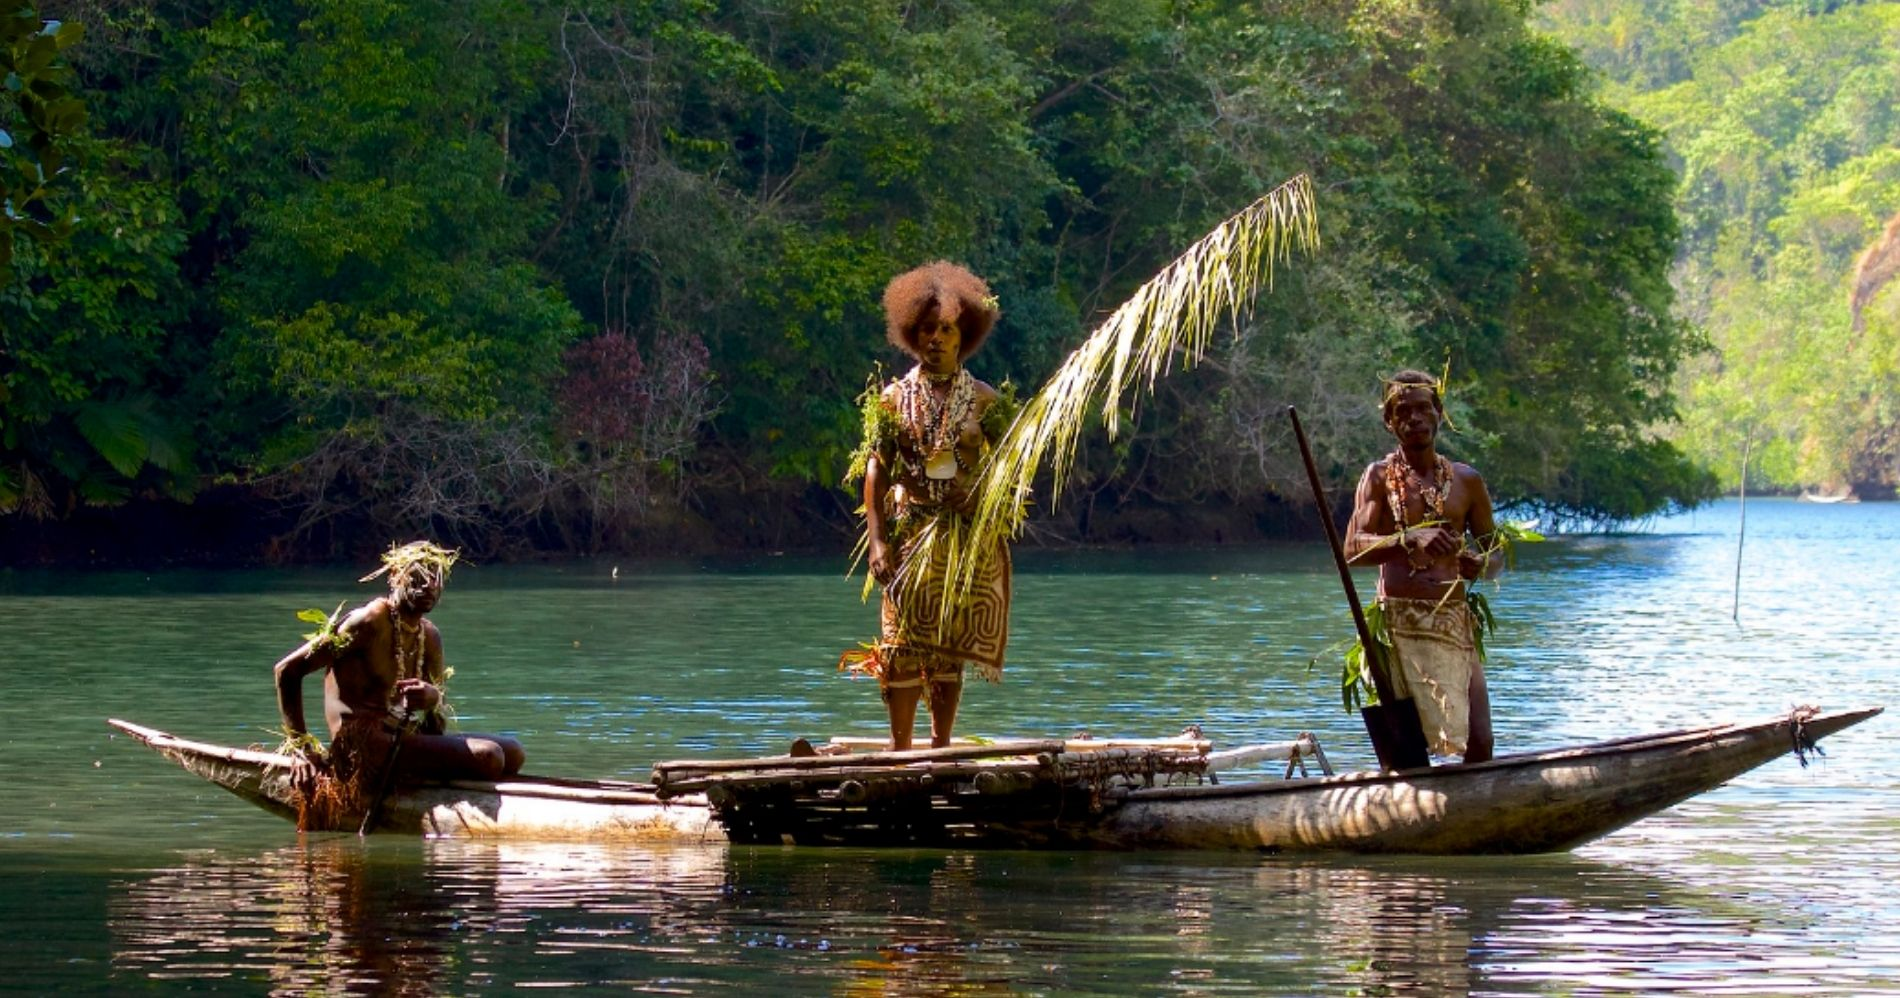 Papua New Guinea Illustration Web Bisnis Muda - Image: Flickr